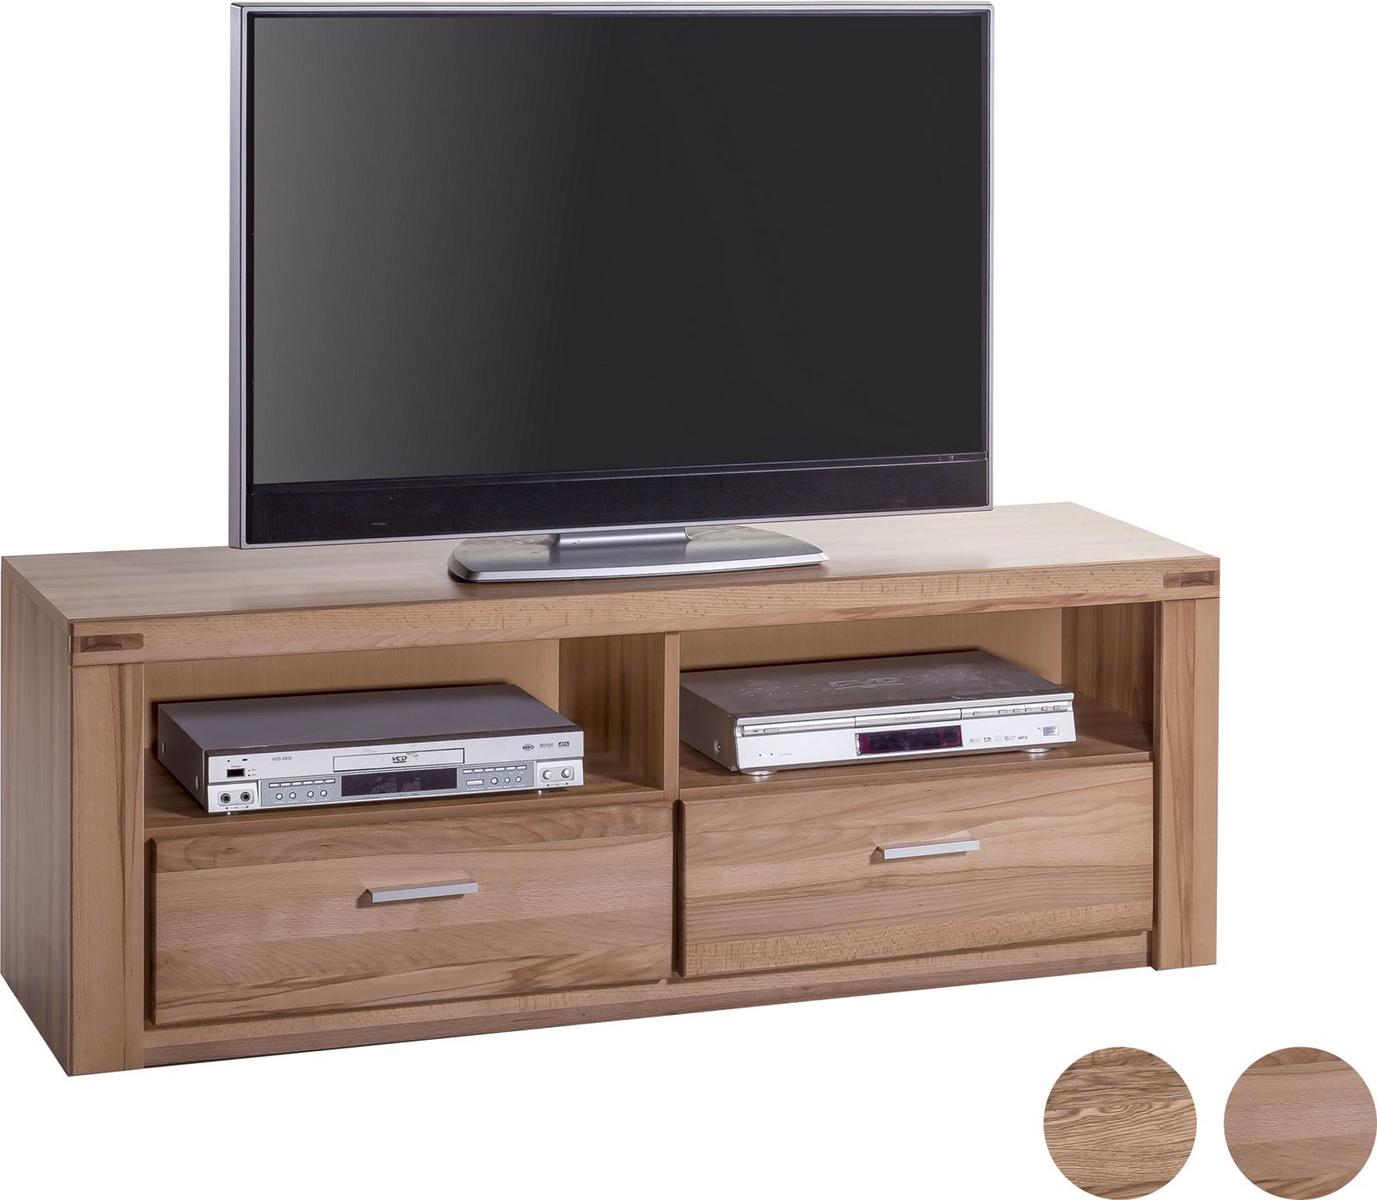 ikea phonombel long dresser ikea awesome all wood drawer slide design with ikea highboard with. Black Bedroom Furniture Sets. Home Design Ideas